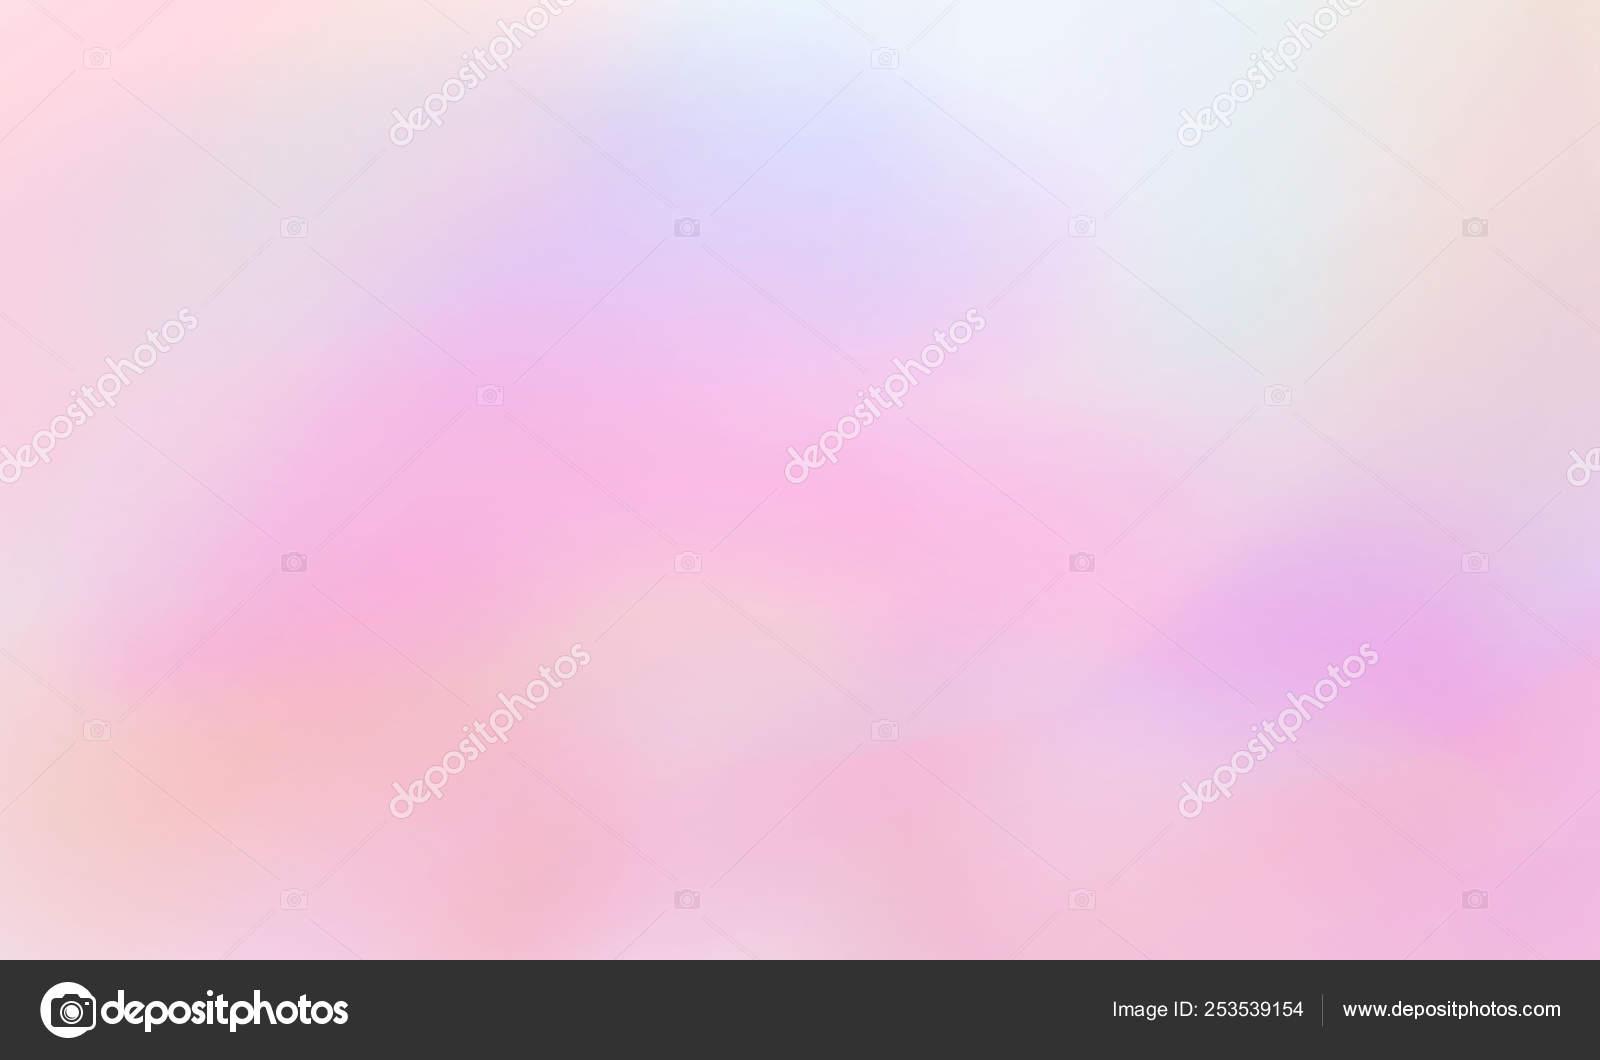 depositphotos 253539154 stock illustration rainbow princess background soft pink